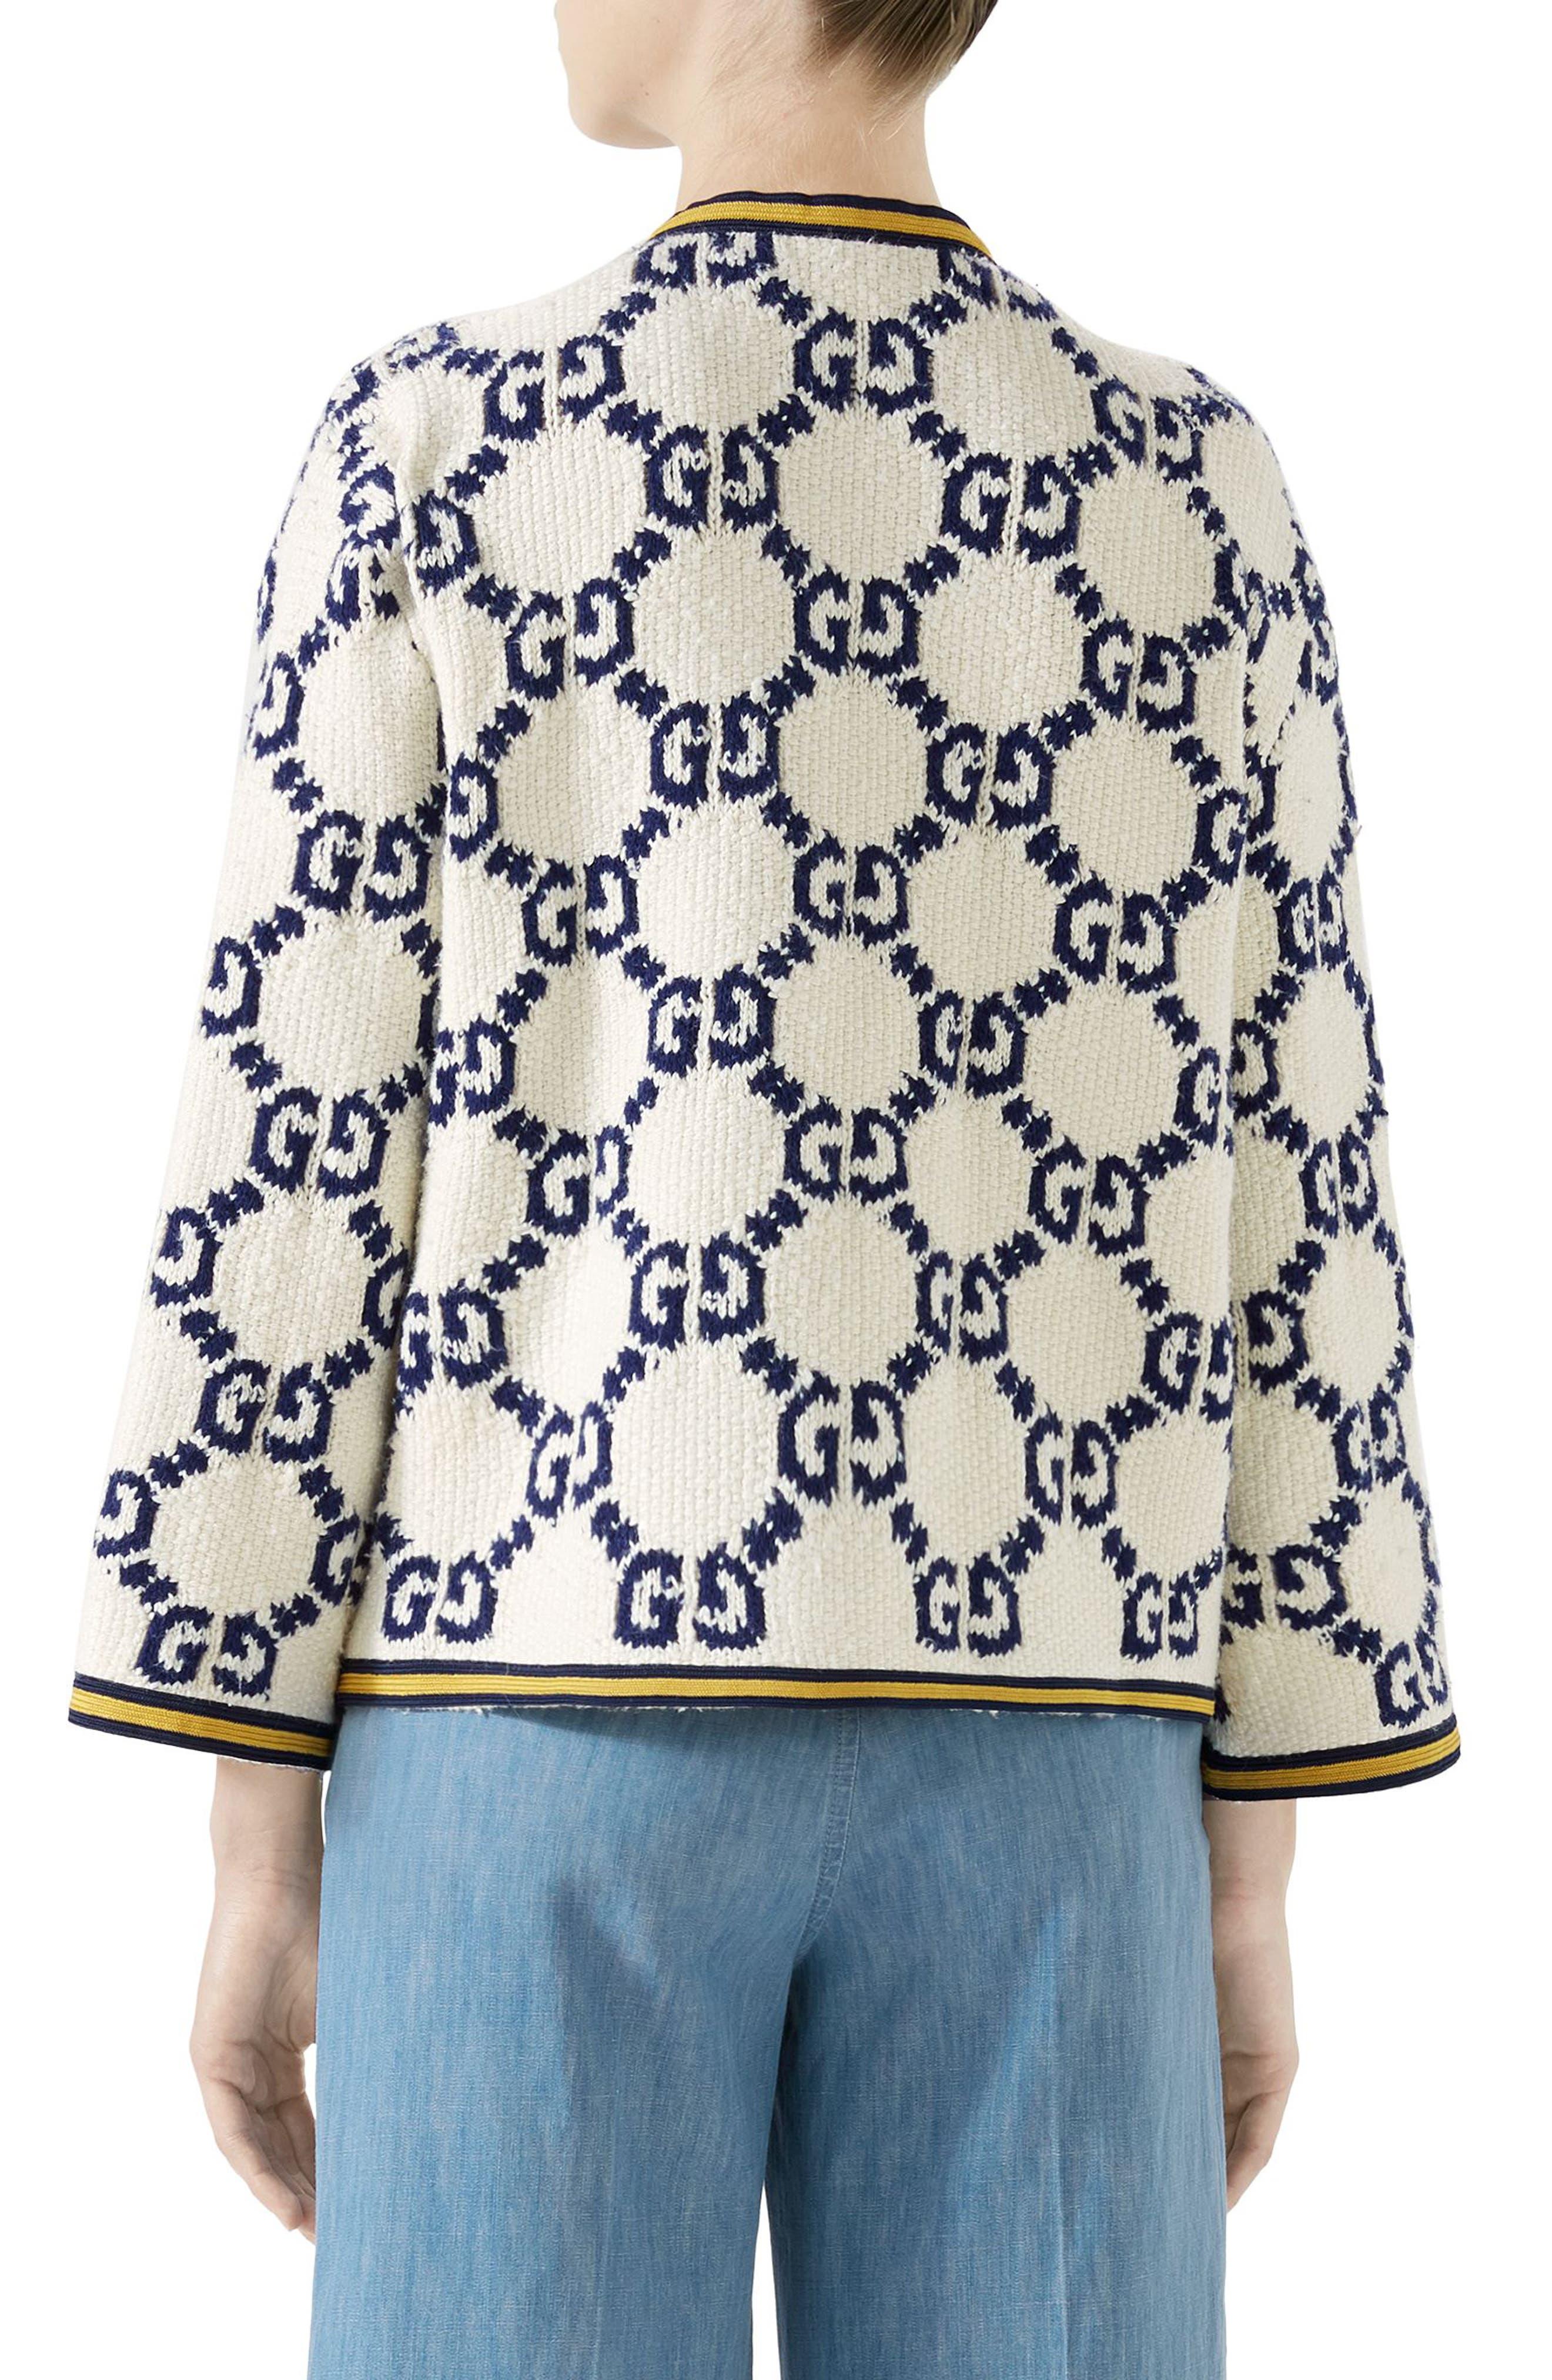 GG Textured Silk, Wool & Linen Tweed Jacket,                             Alternate thumbnail 2, color,                             MULTI